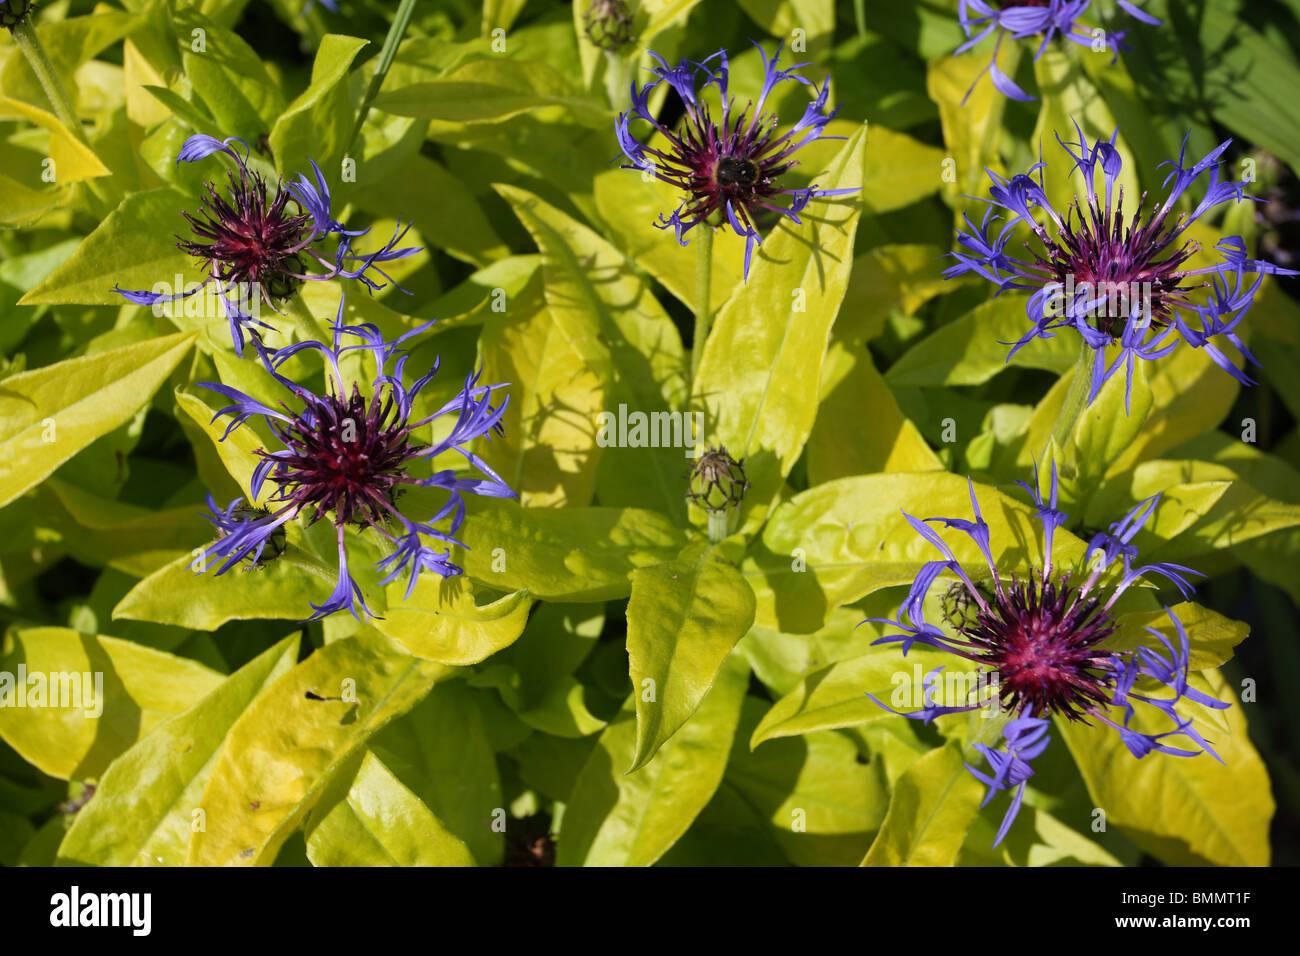 CENTAUREA MONTANA GOLD BULLION PLANT IN FLOWER - Stock Image